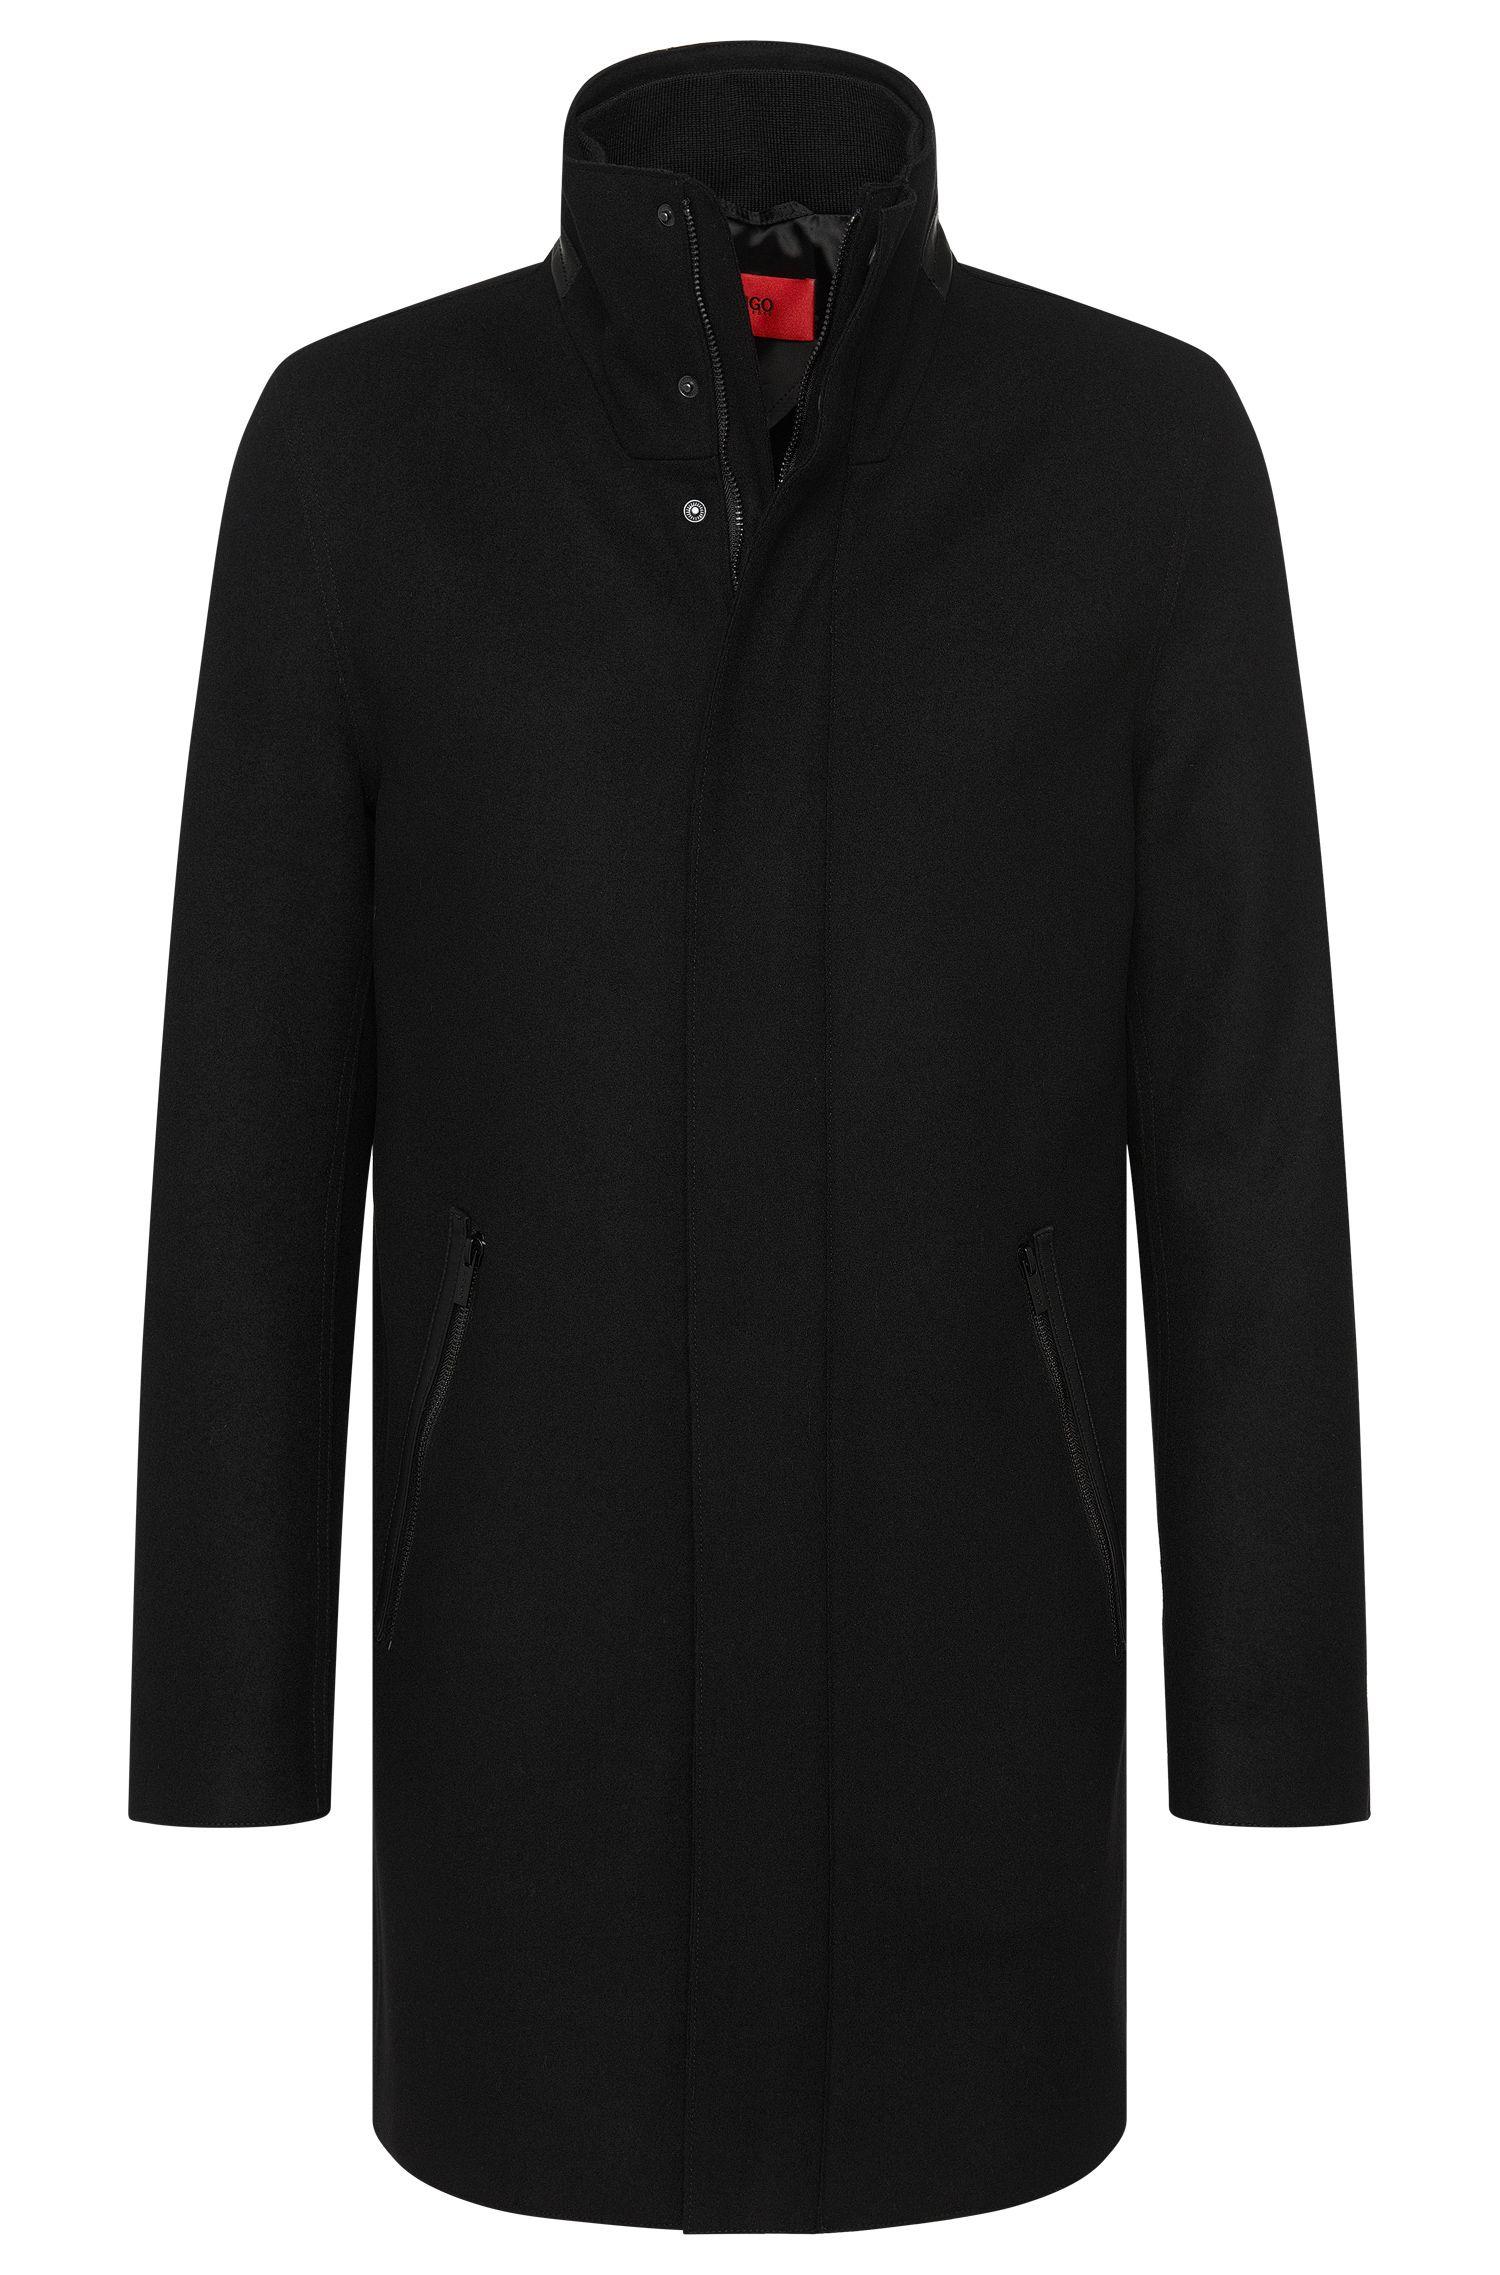 'Mantek' | Virgin Wool Cashmere Blend Coat